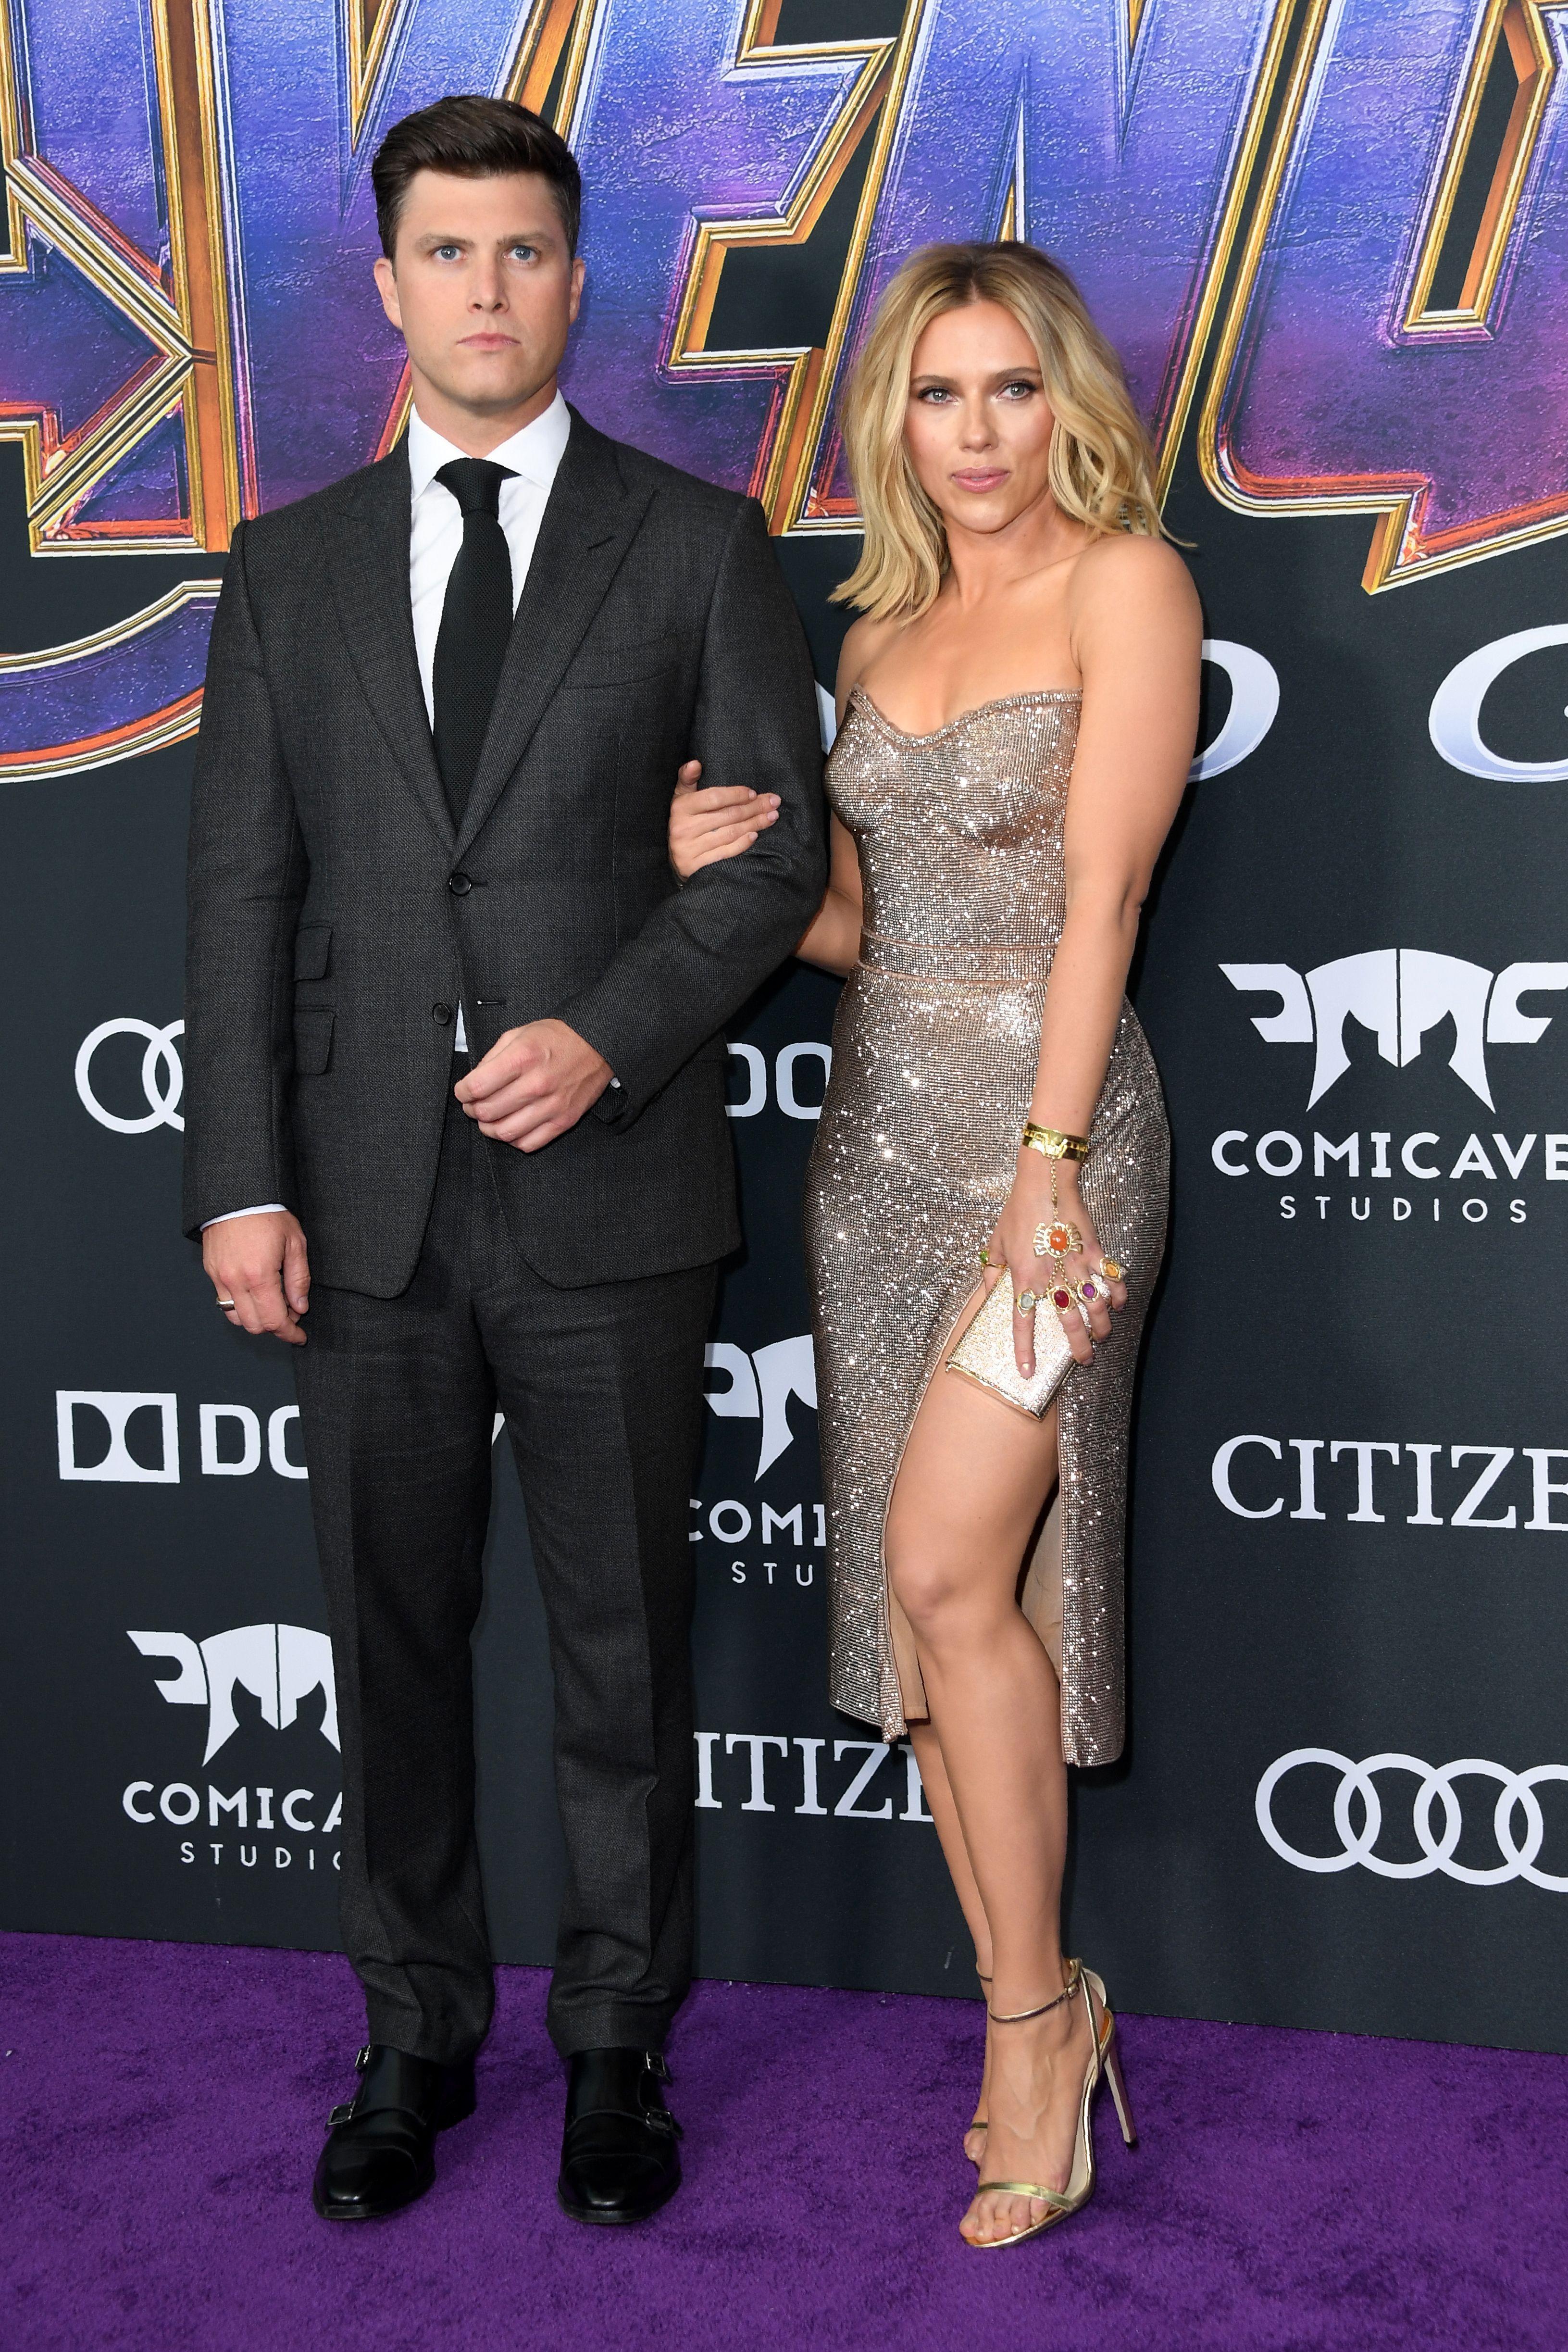 Scarlett Johansson and Colin Jost Johansson in Atelier Versace.